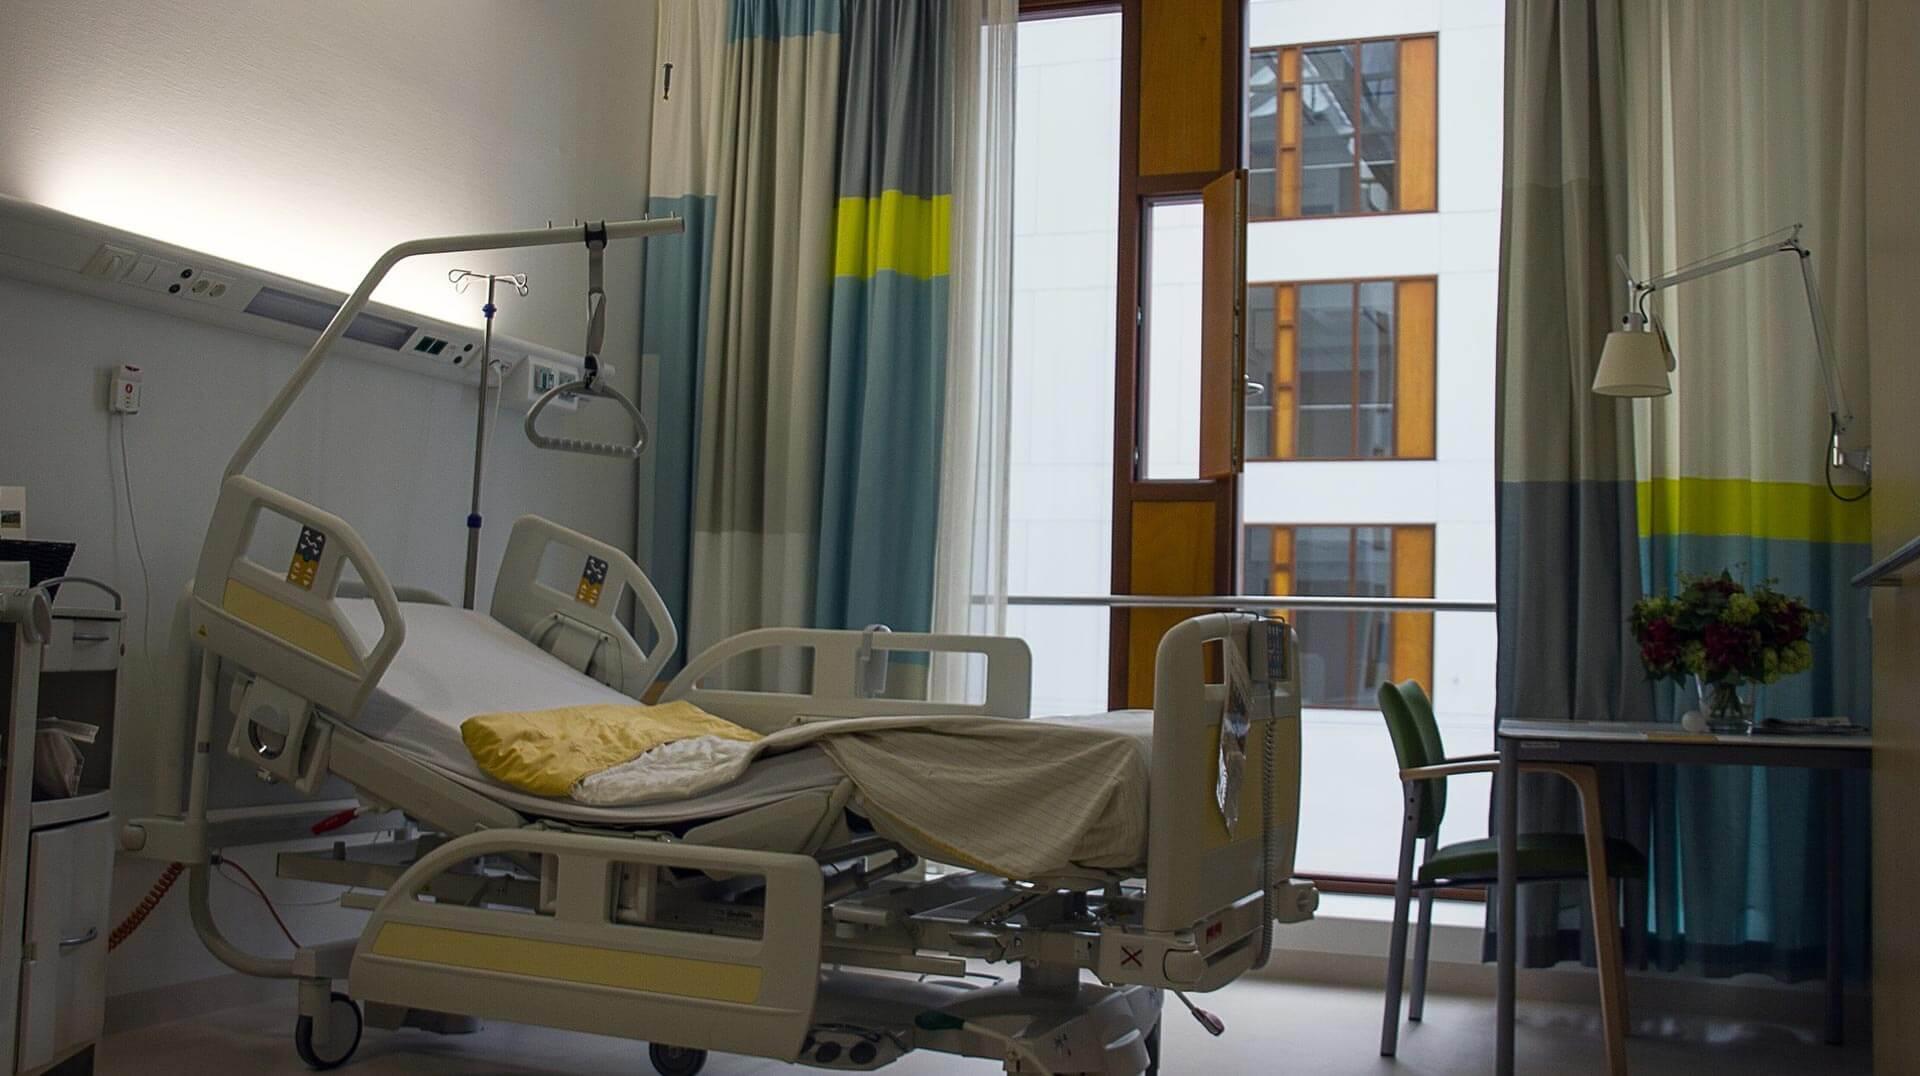 forced cesarean hospital bed